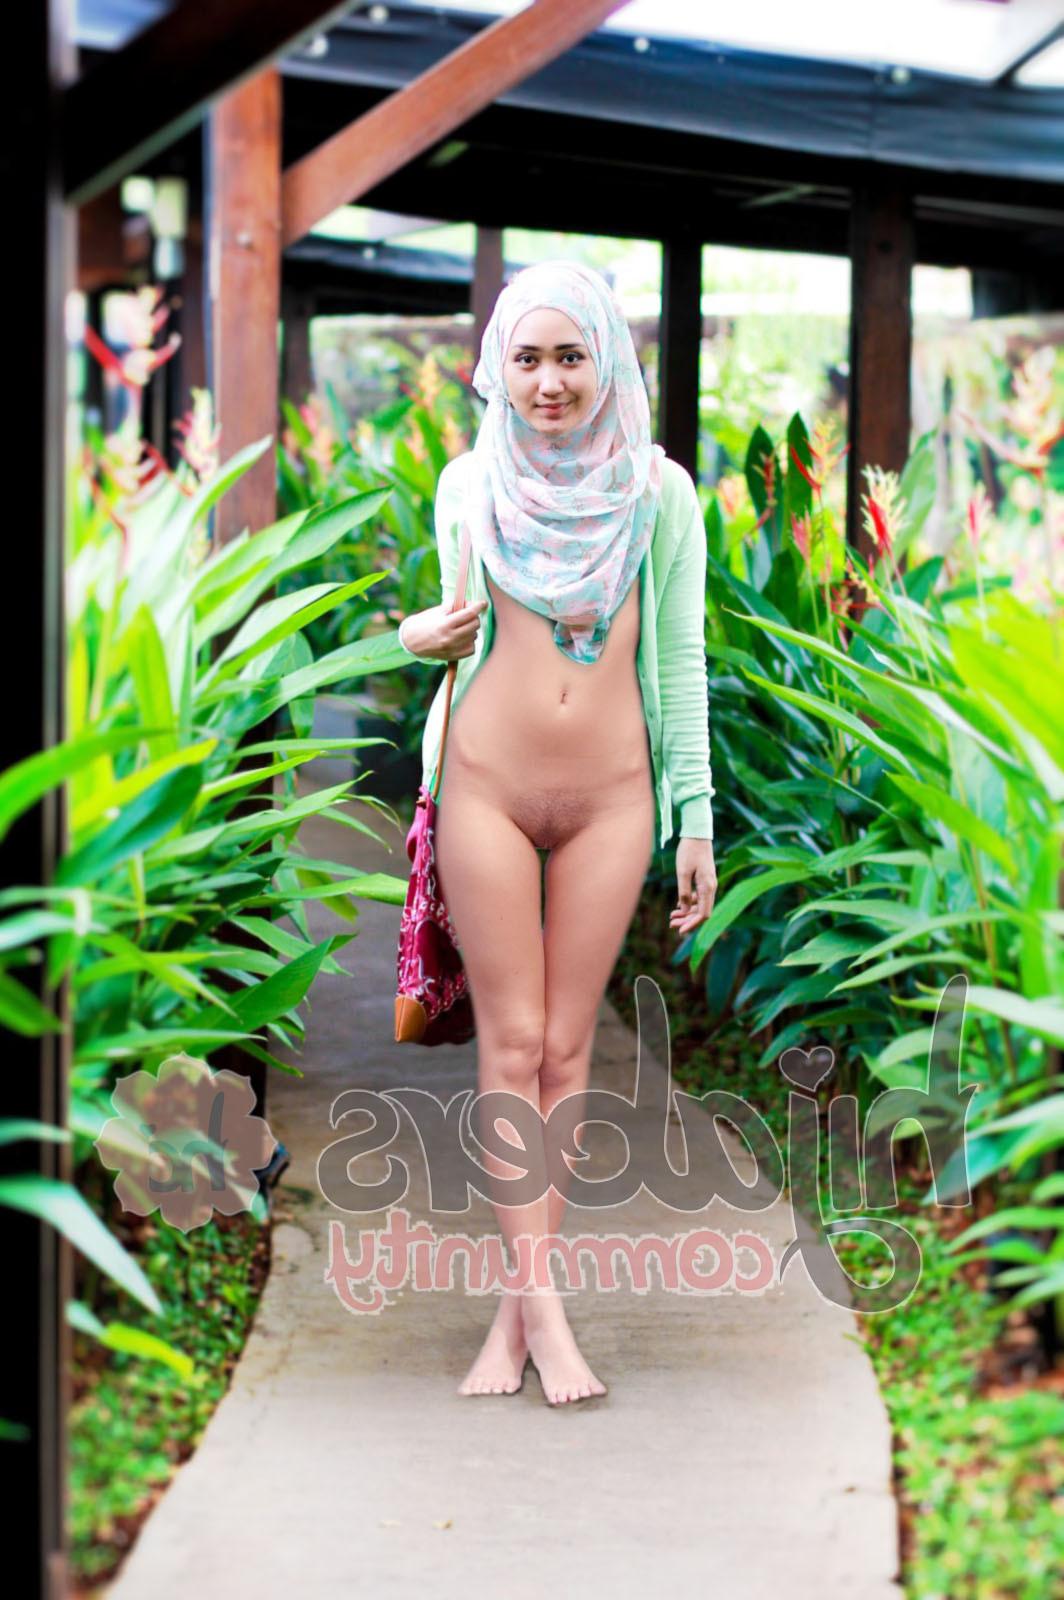 Nude hijab girls from malaysia and indonesia 013 - Muslim Girl Nude Sexy Photos Nangi Images